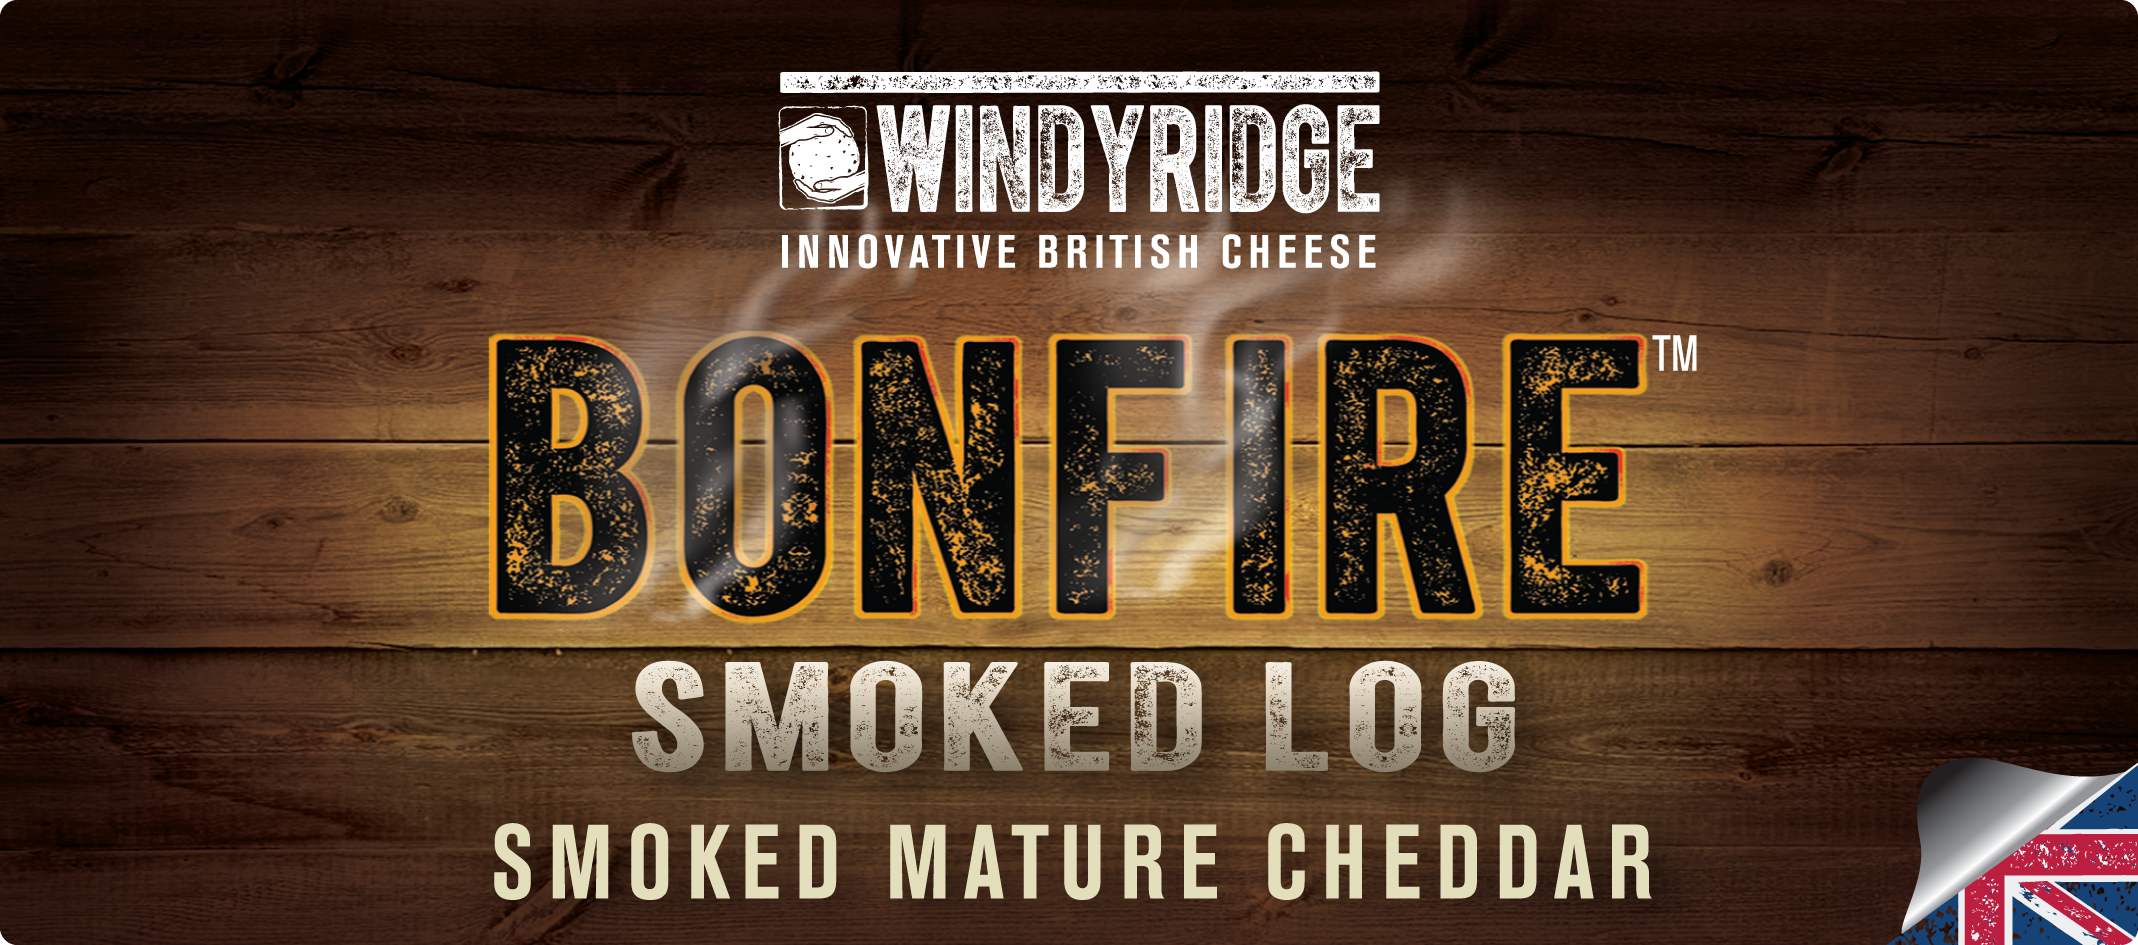 Bonfire™ Smoked Log Label by WIndyridge Cheese Ltd (scheduled via http://www.tailwindapp.com?utm_source=pinterest&utm_medium=twpin&utm_content=post4964048&utm_campaign=scheduler_attribution)